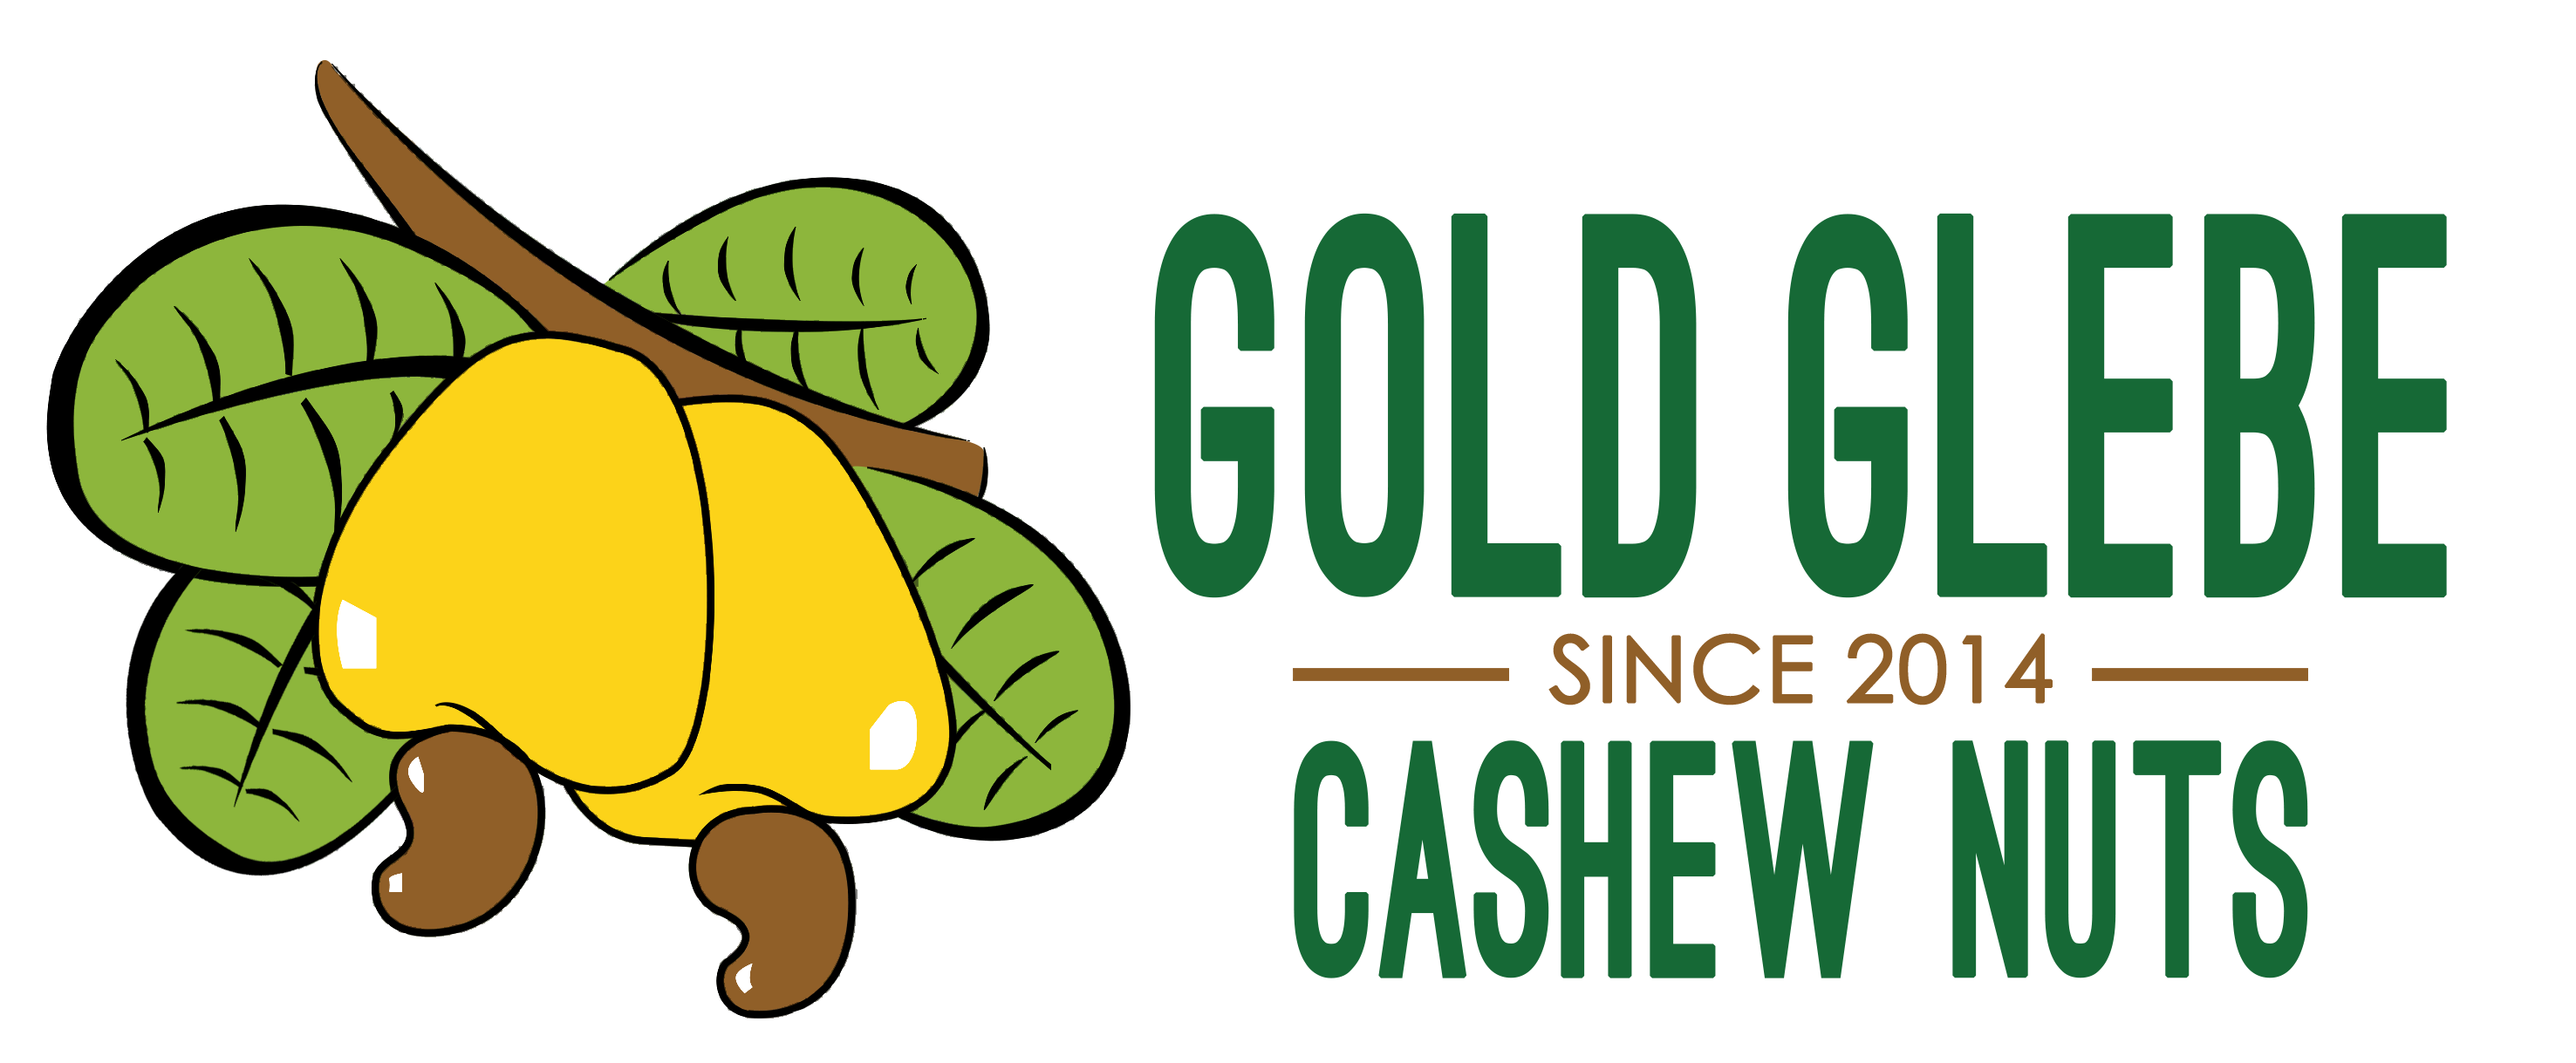 Nut clipart cashew nut. Gold glebe raw home